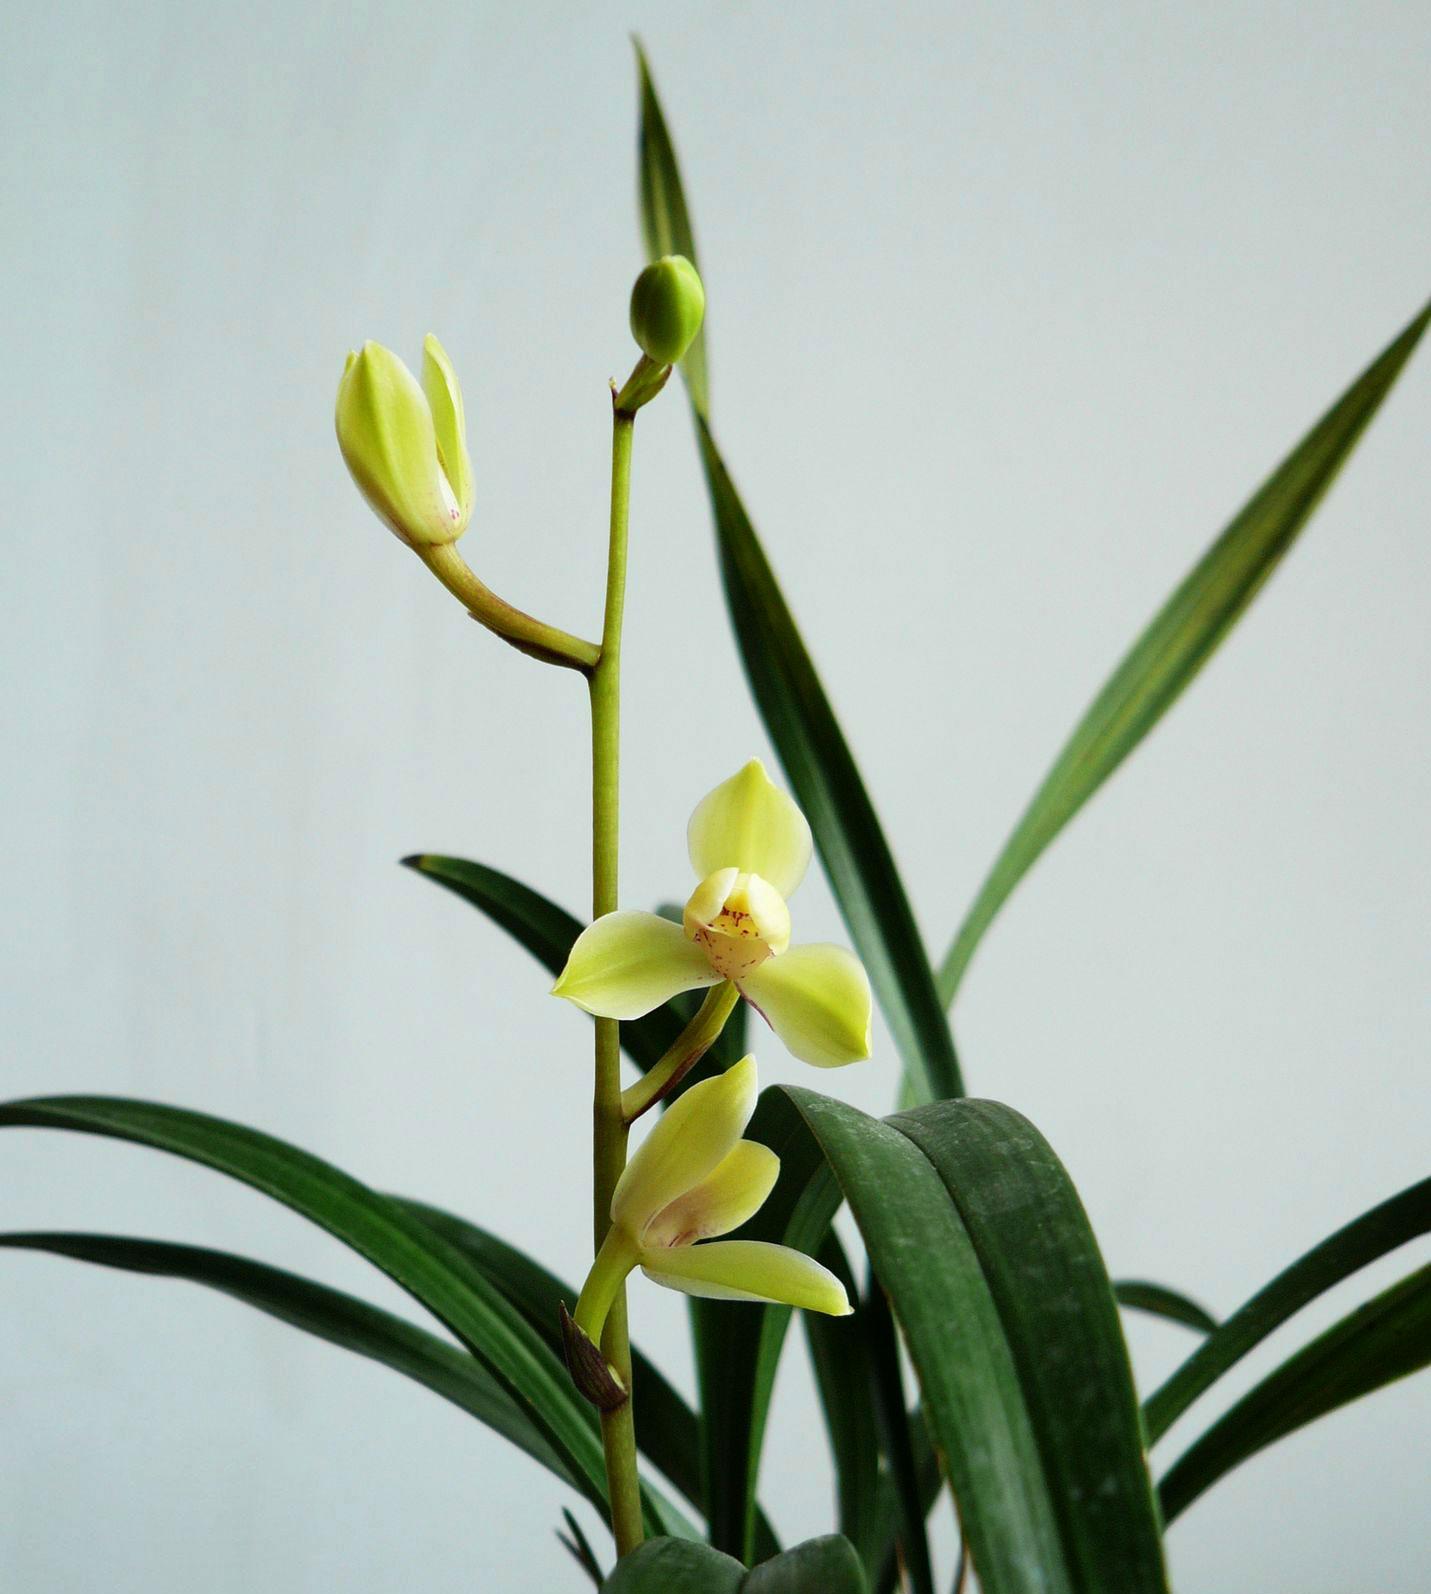 建兰中华水仙/裕梅Cym.ensifolium'Zhong Hua Shui Xian'